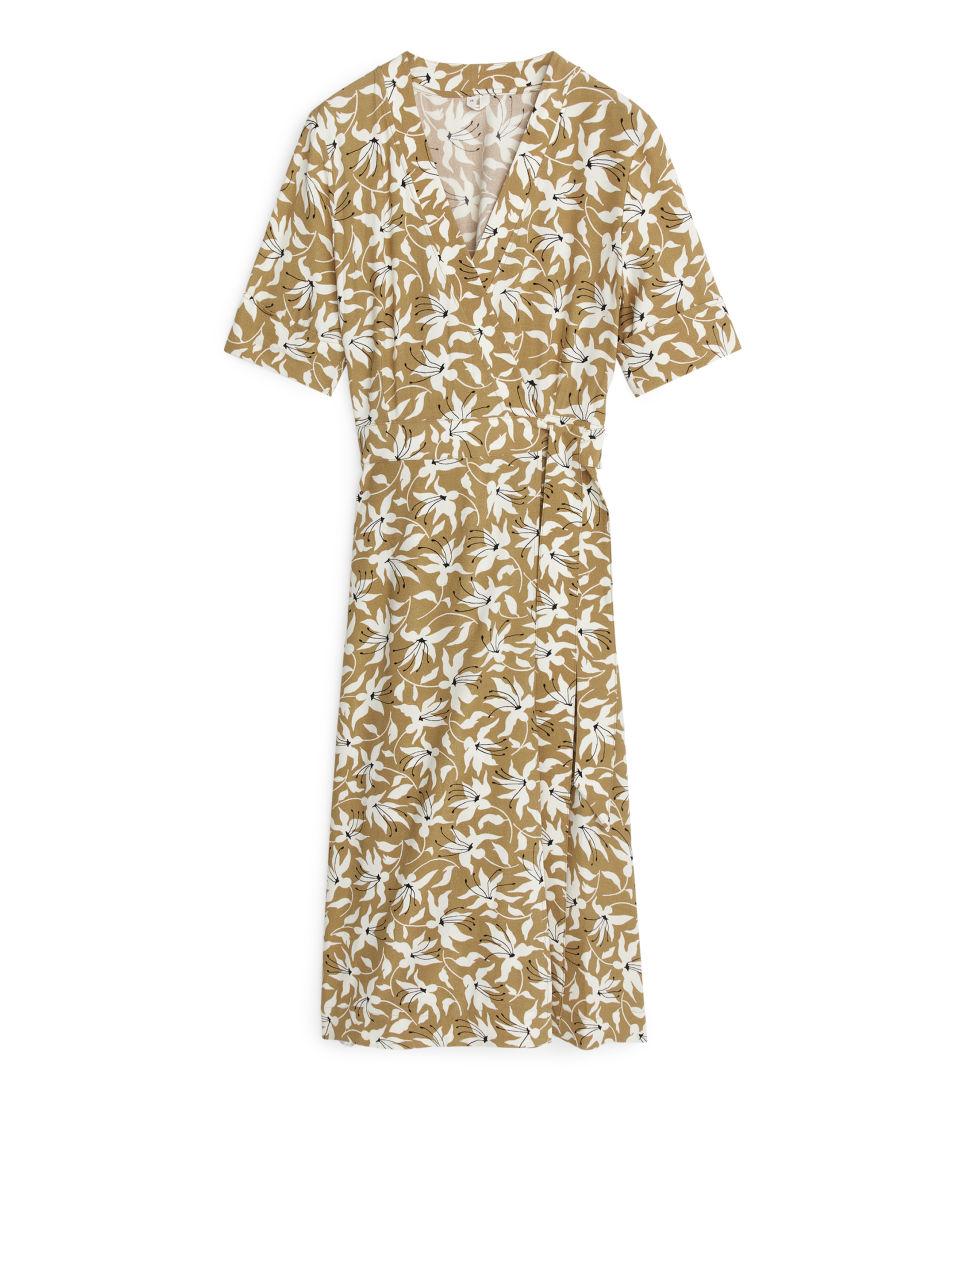 Printed Wrap Dress - Beige